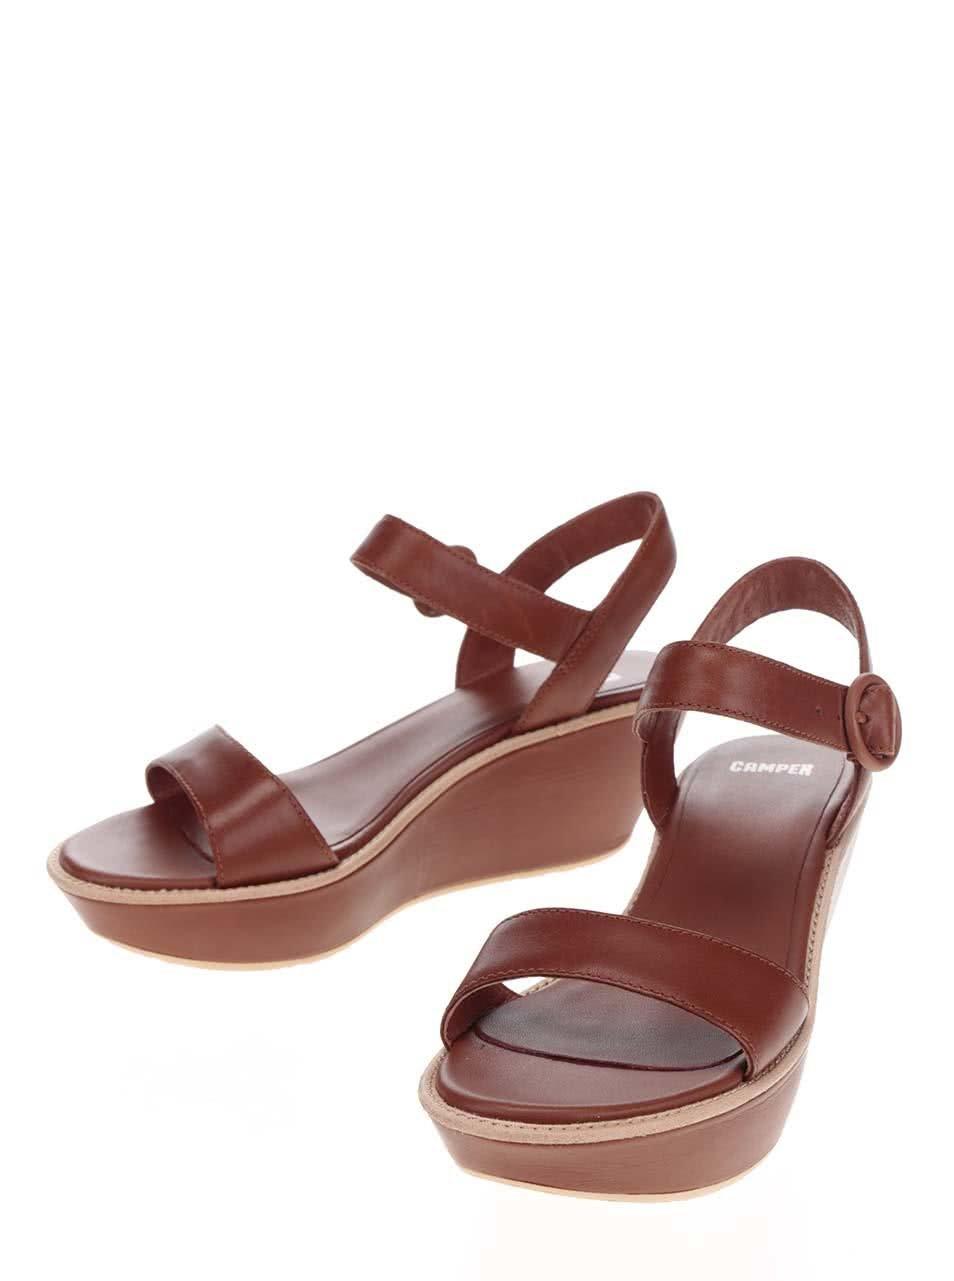 4fb90b4d4af7 Hnedé dámske kožené sandále na platforme Camper ...